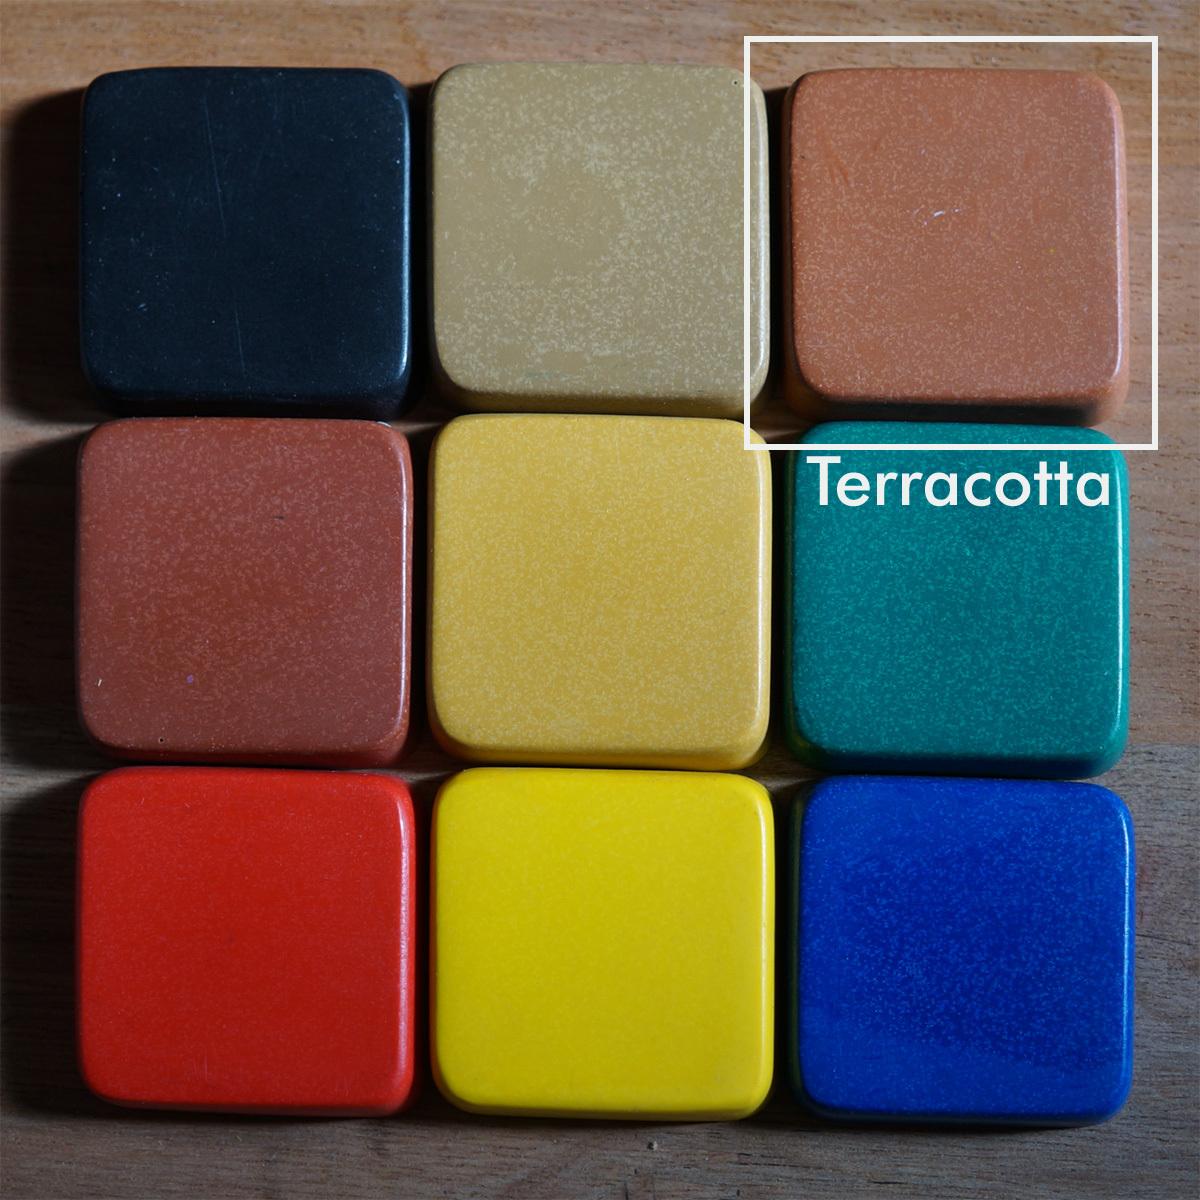 PIGMENT TERRACOTTA 100g(着色剤:テラコッタ 100g) - 画像2